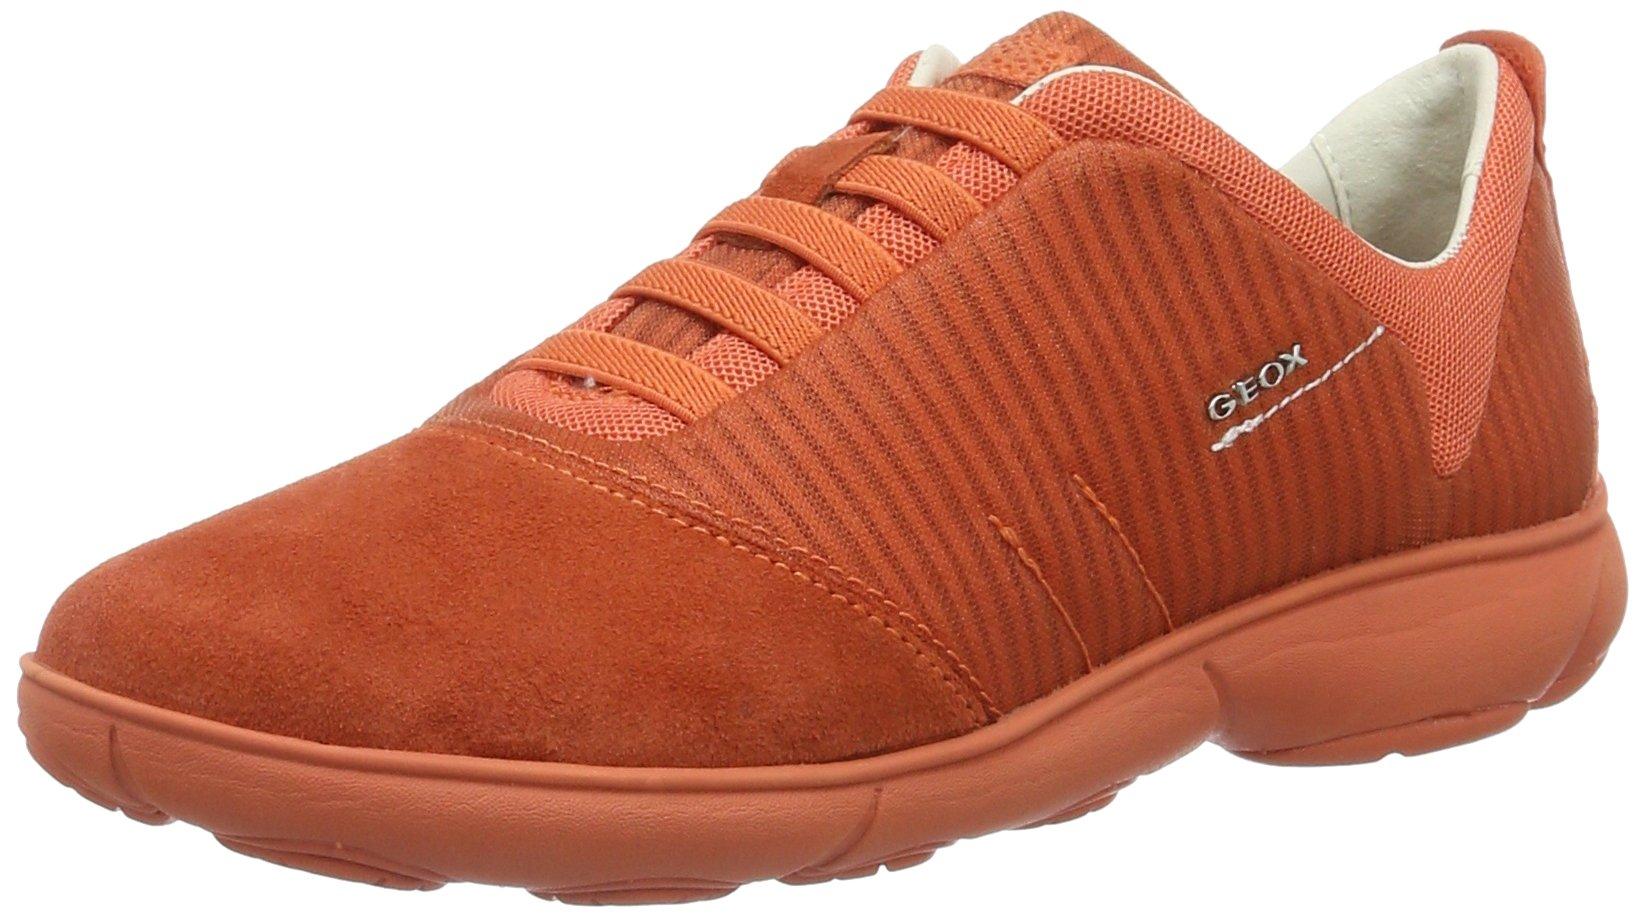 Geox FemmeOrangedk GBaskets Orangec701238 Basses Eu D Nebula jc3A4R5Lq